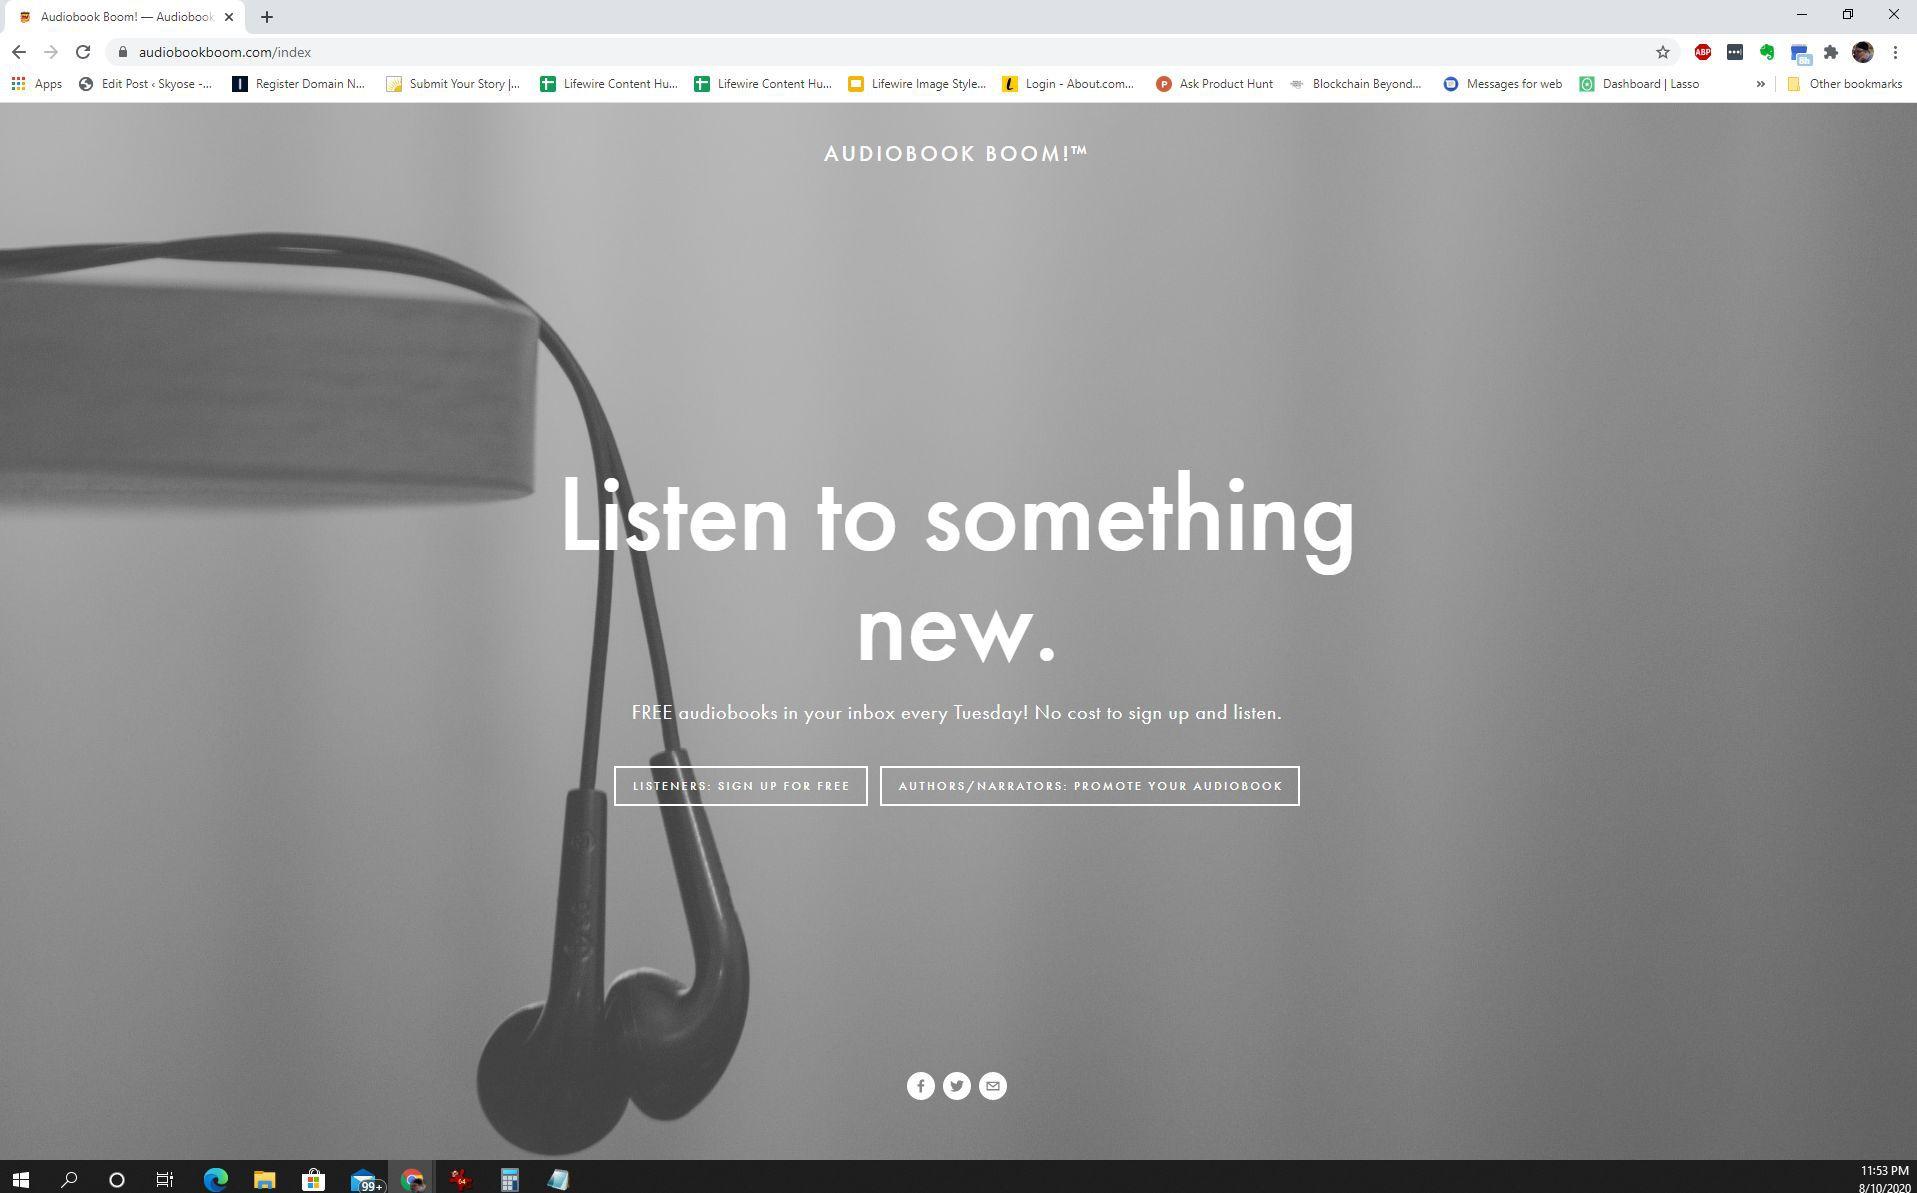 Screenshot of Audiobook Boom free audiobooks for reviews